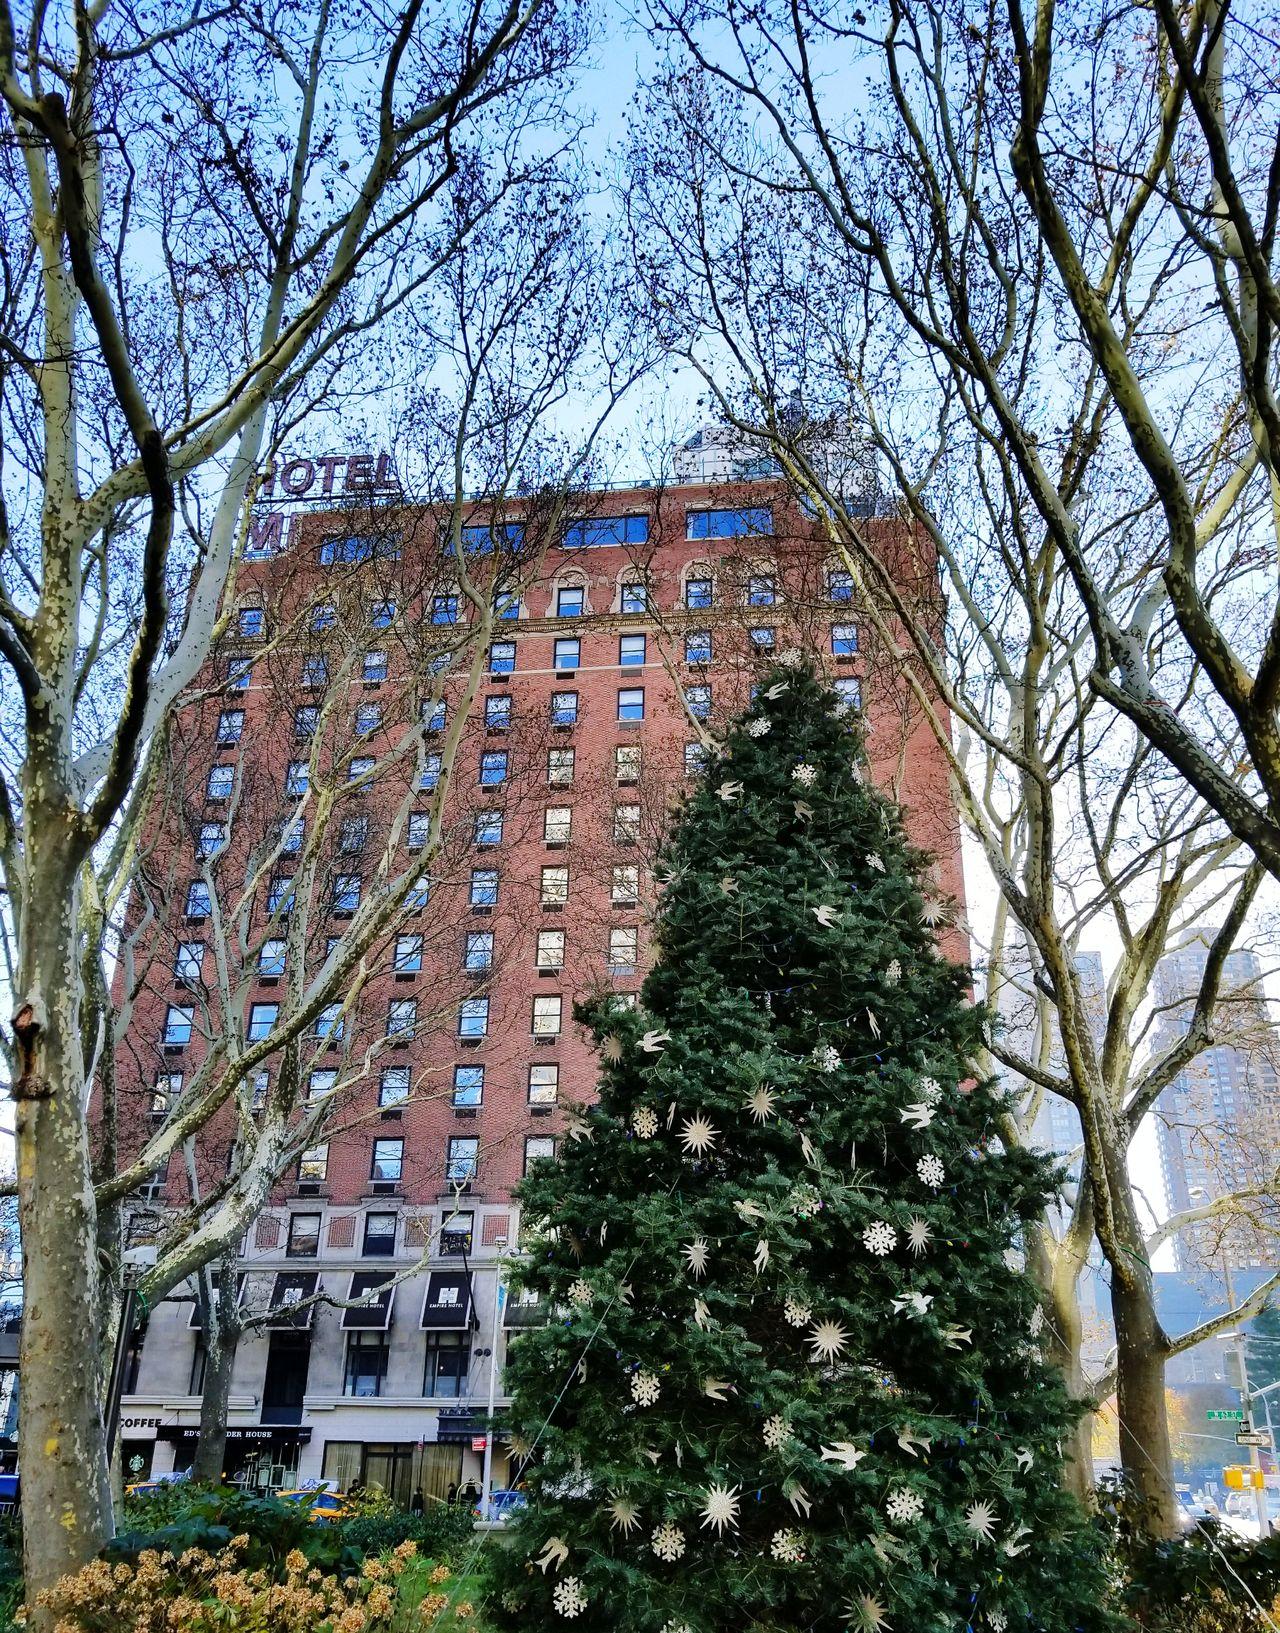 Christmas Tree Holiday Season City Life New York Manhattan New York City Travel Destinations